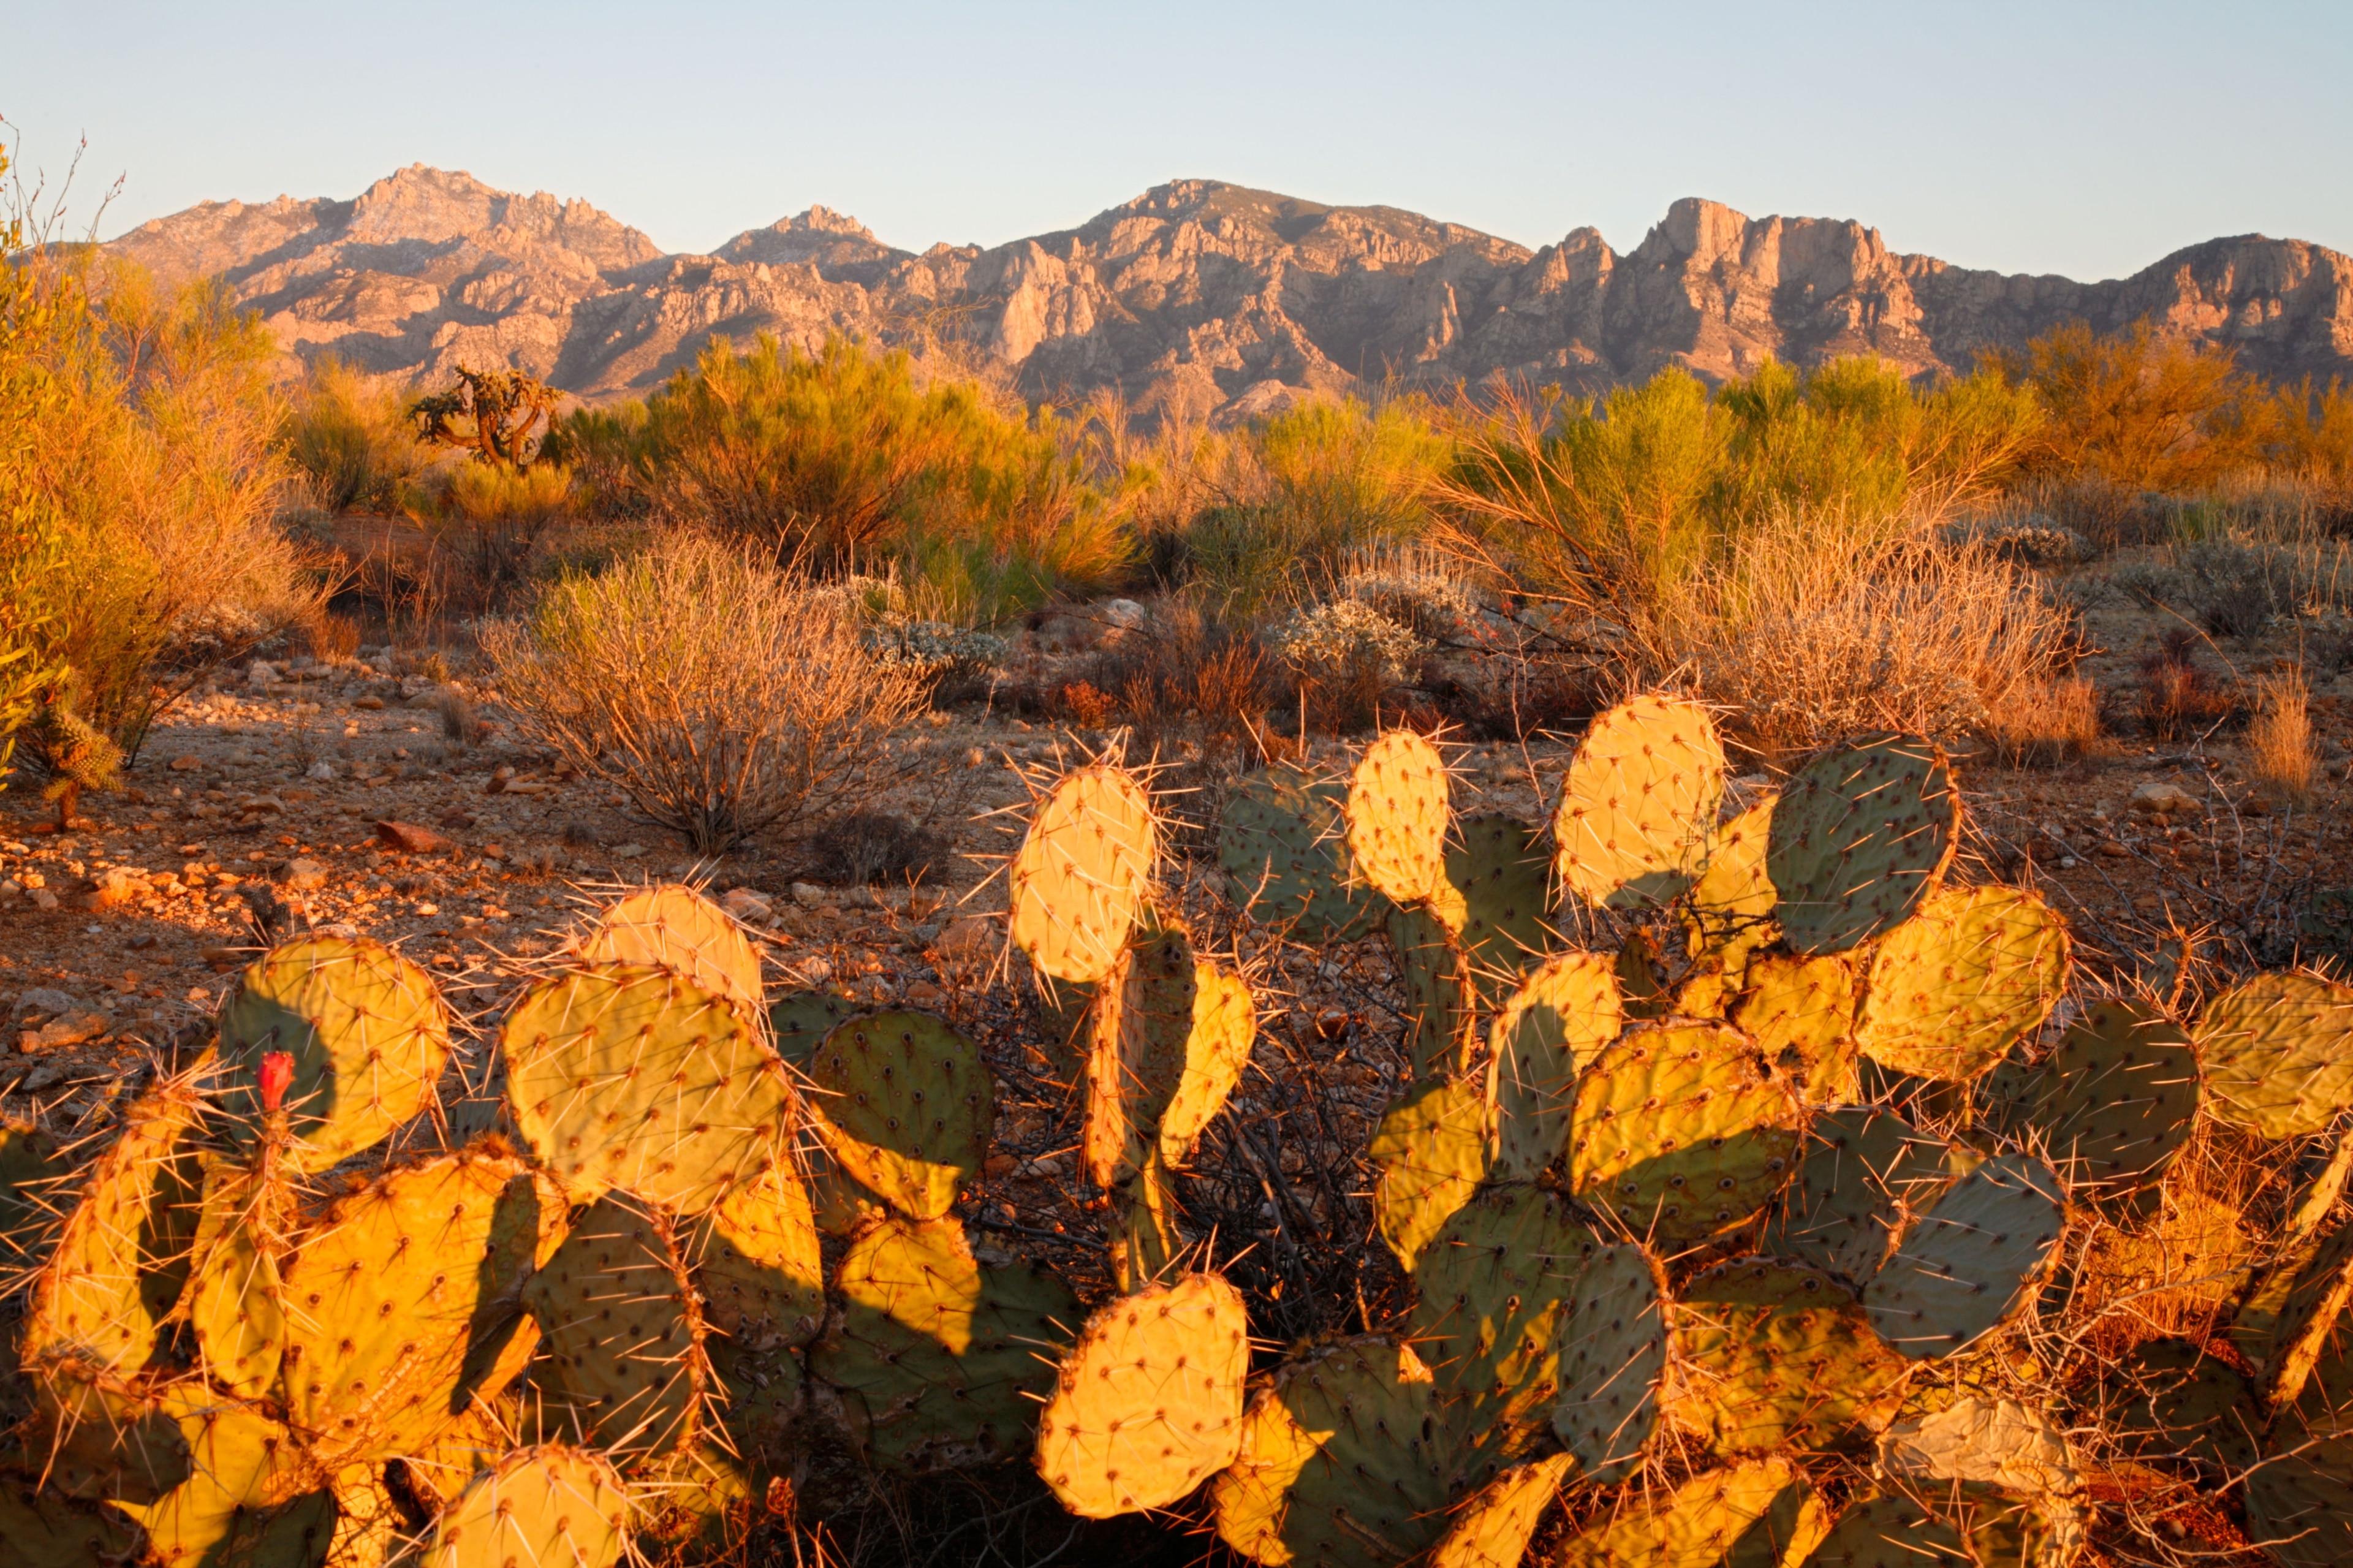 Oro Valley, Arizona, United States of America